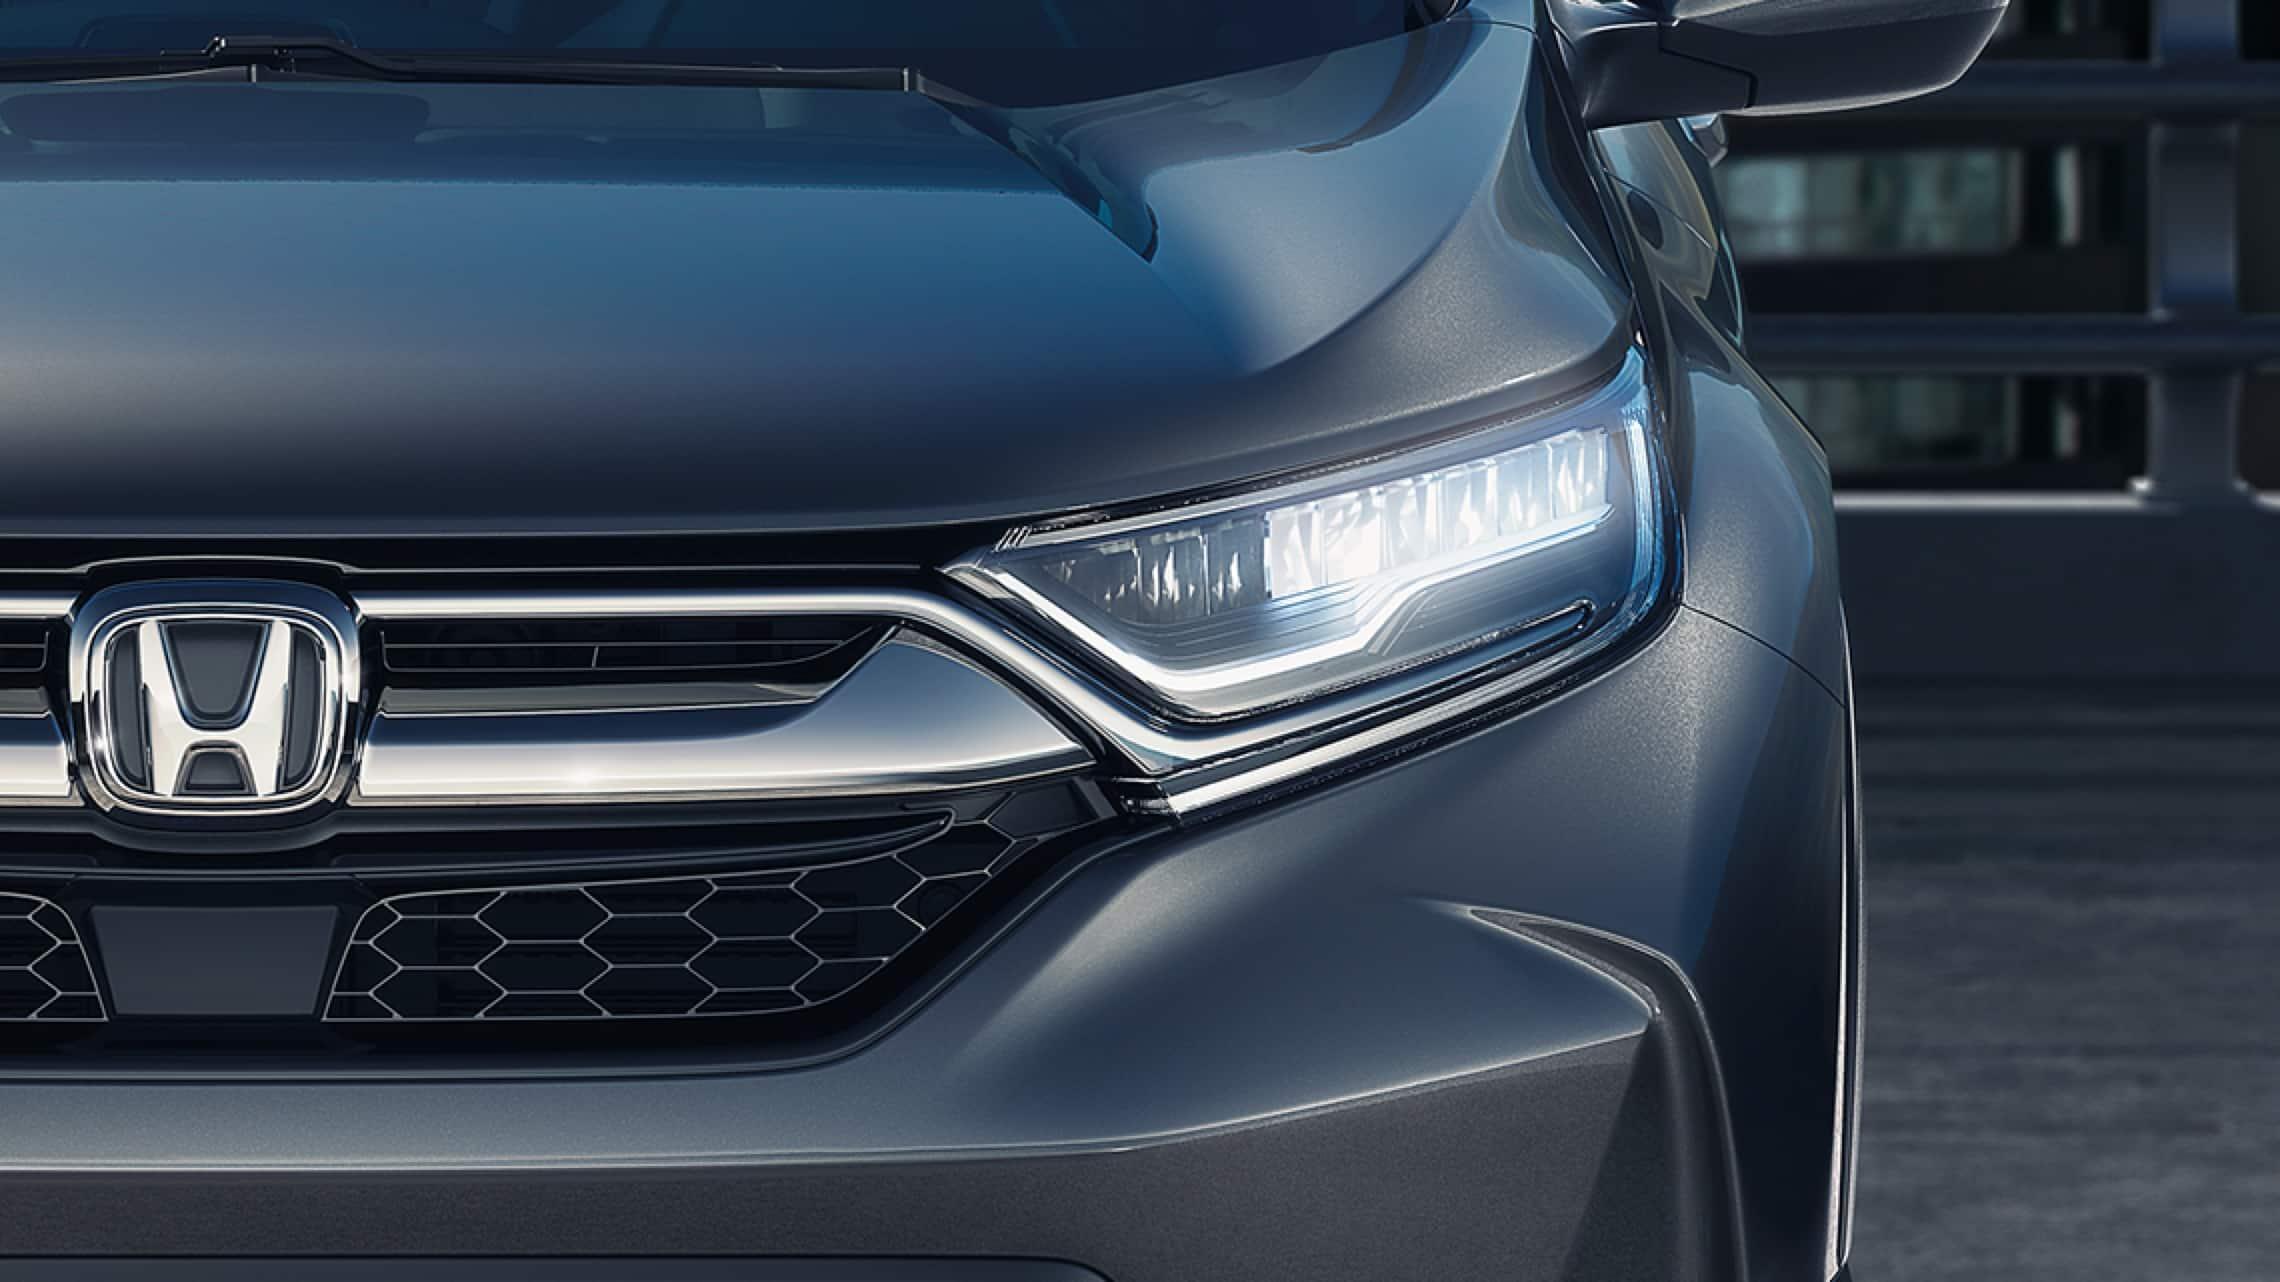 Vista frontal de cerca de la Honda CR-V Touring 2019 con luces delanteras de LED con encendido/apagado automático.